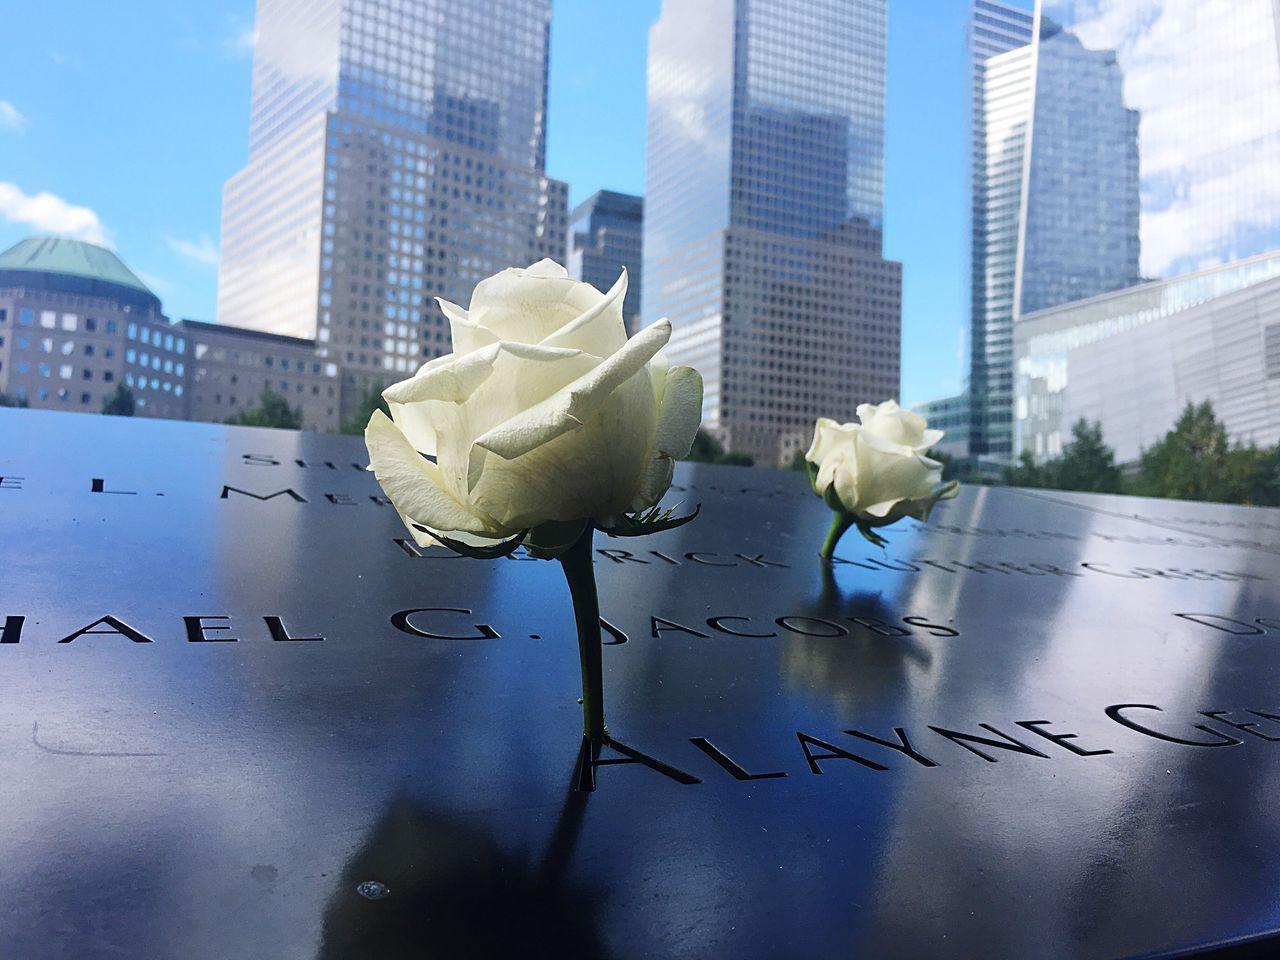 Building Exterior City 911memorial NY City Manhattan USA Helenmillerart People